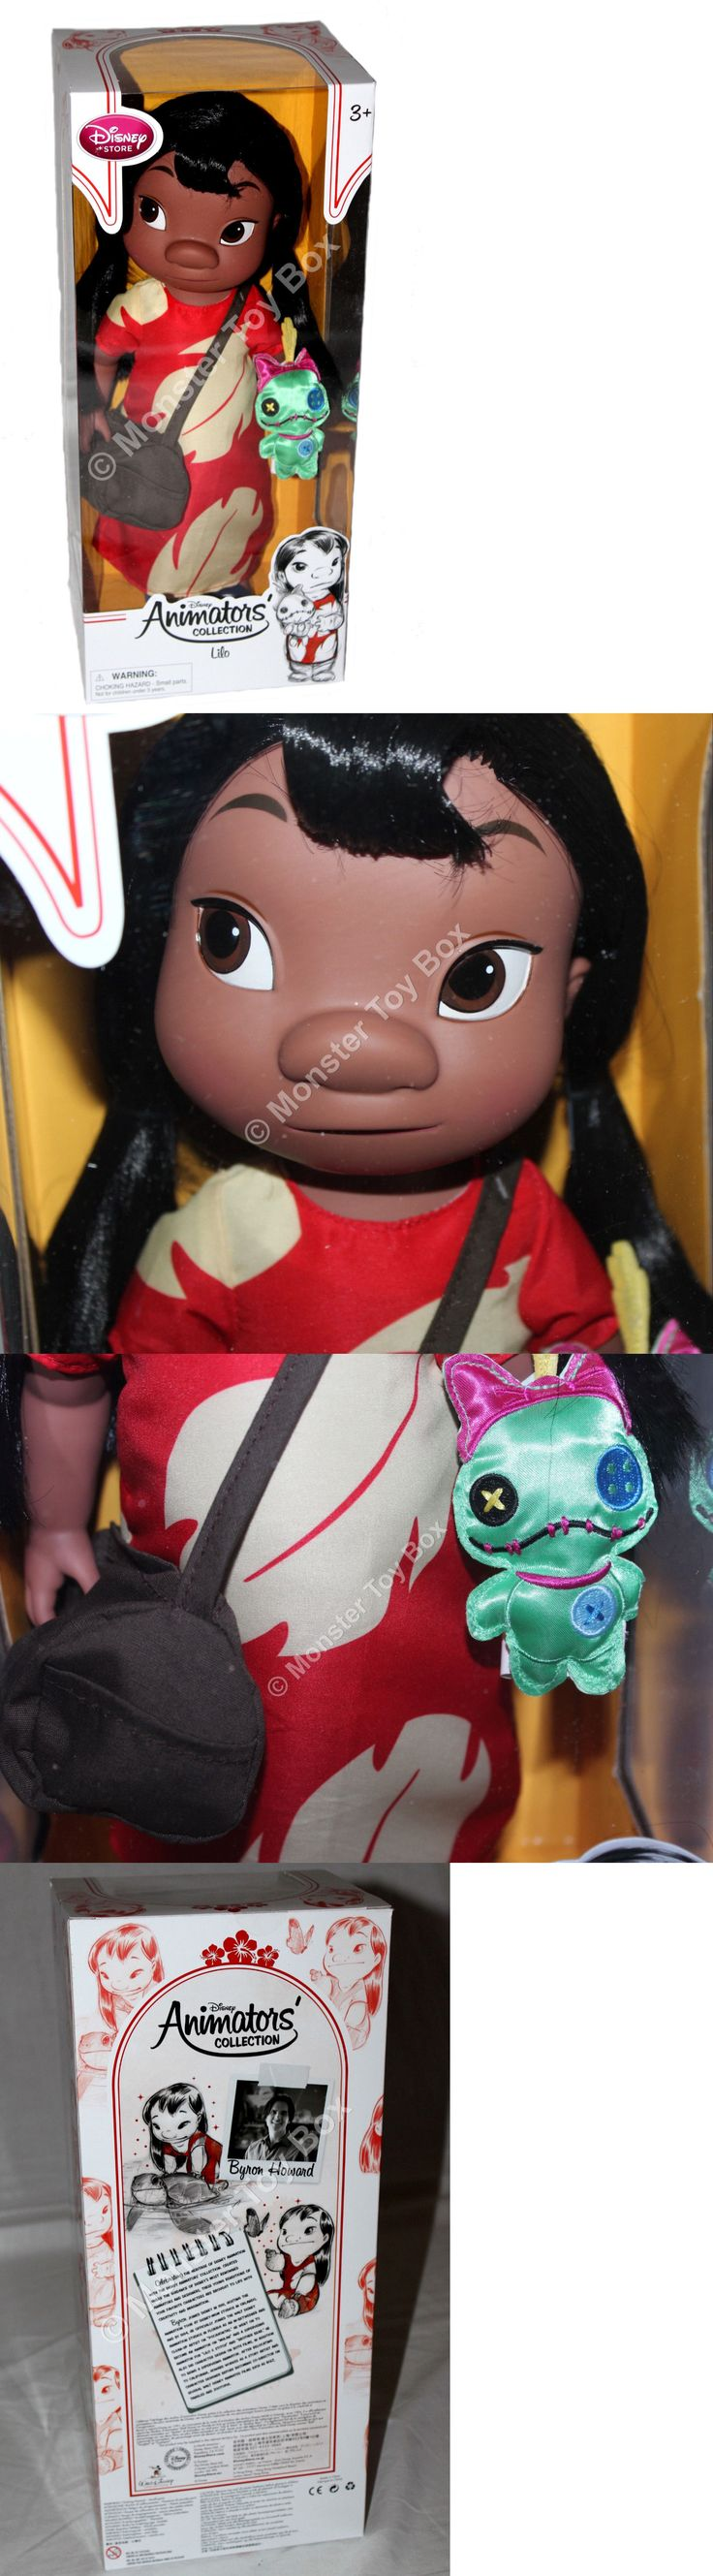 Lilo and Stitch 44035: 16 Animator Toddler Lilo Doll Disney Store Lilo And Stitch -> BUY IT NOW ONLY: $49.6 on eBay!